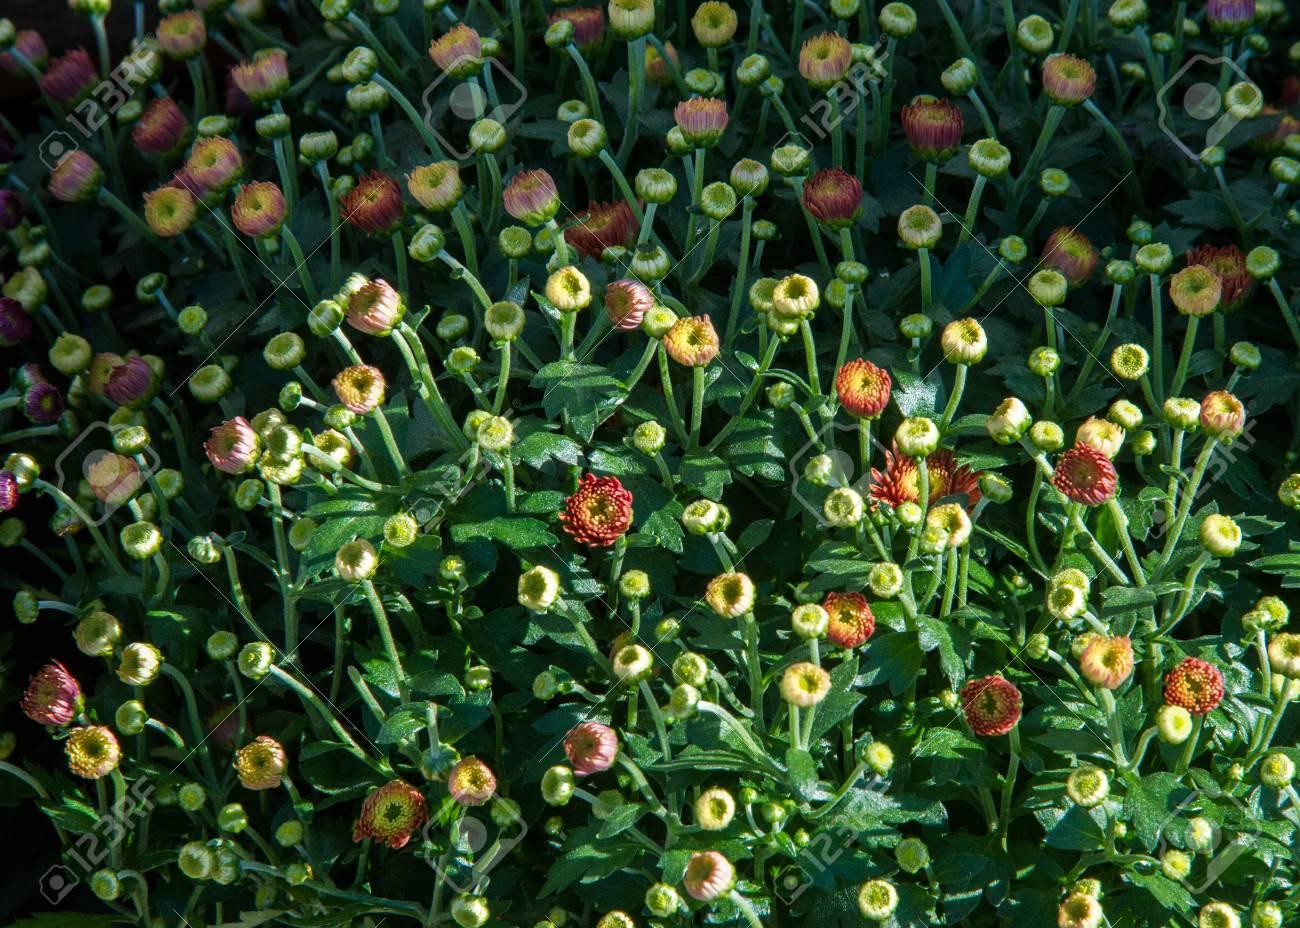 Chrysanthemum flowers unblown a popular plant of the daisy family chrysanthemum flowers unblown a popular plant of the daisy family having brightly colored ornamental izmirmasajfo